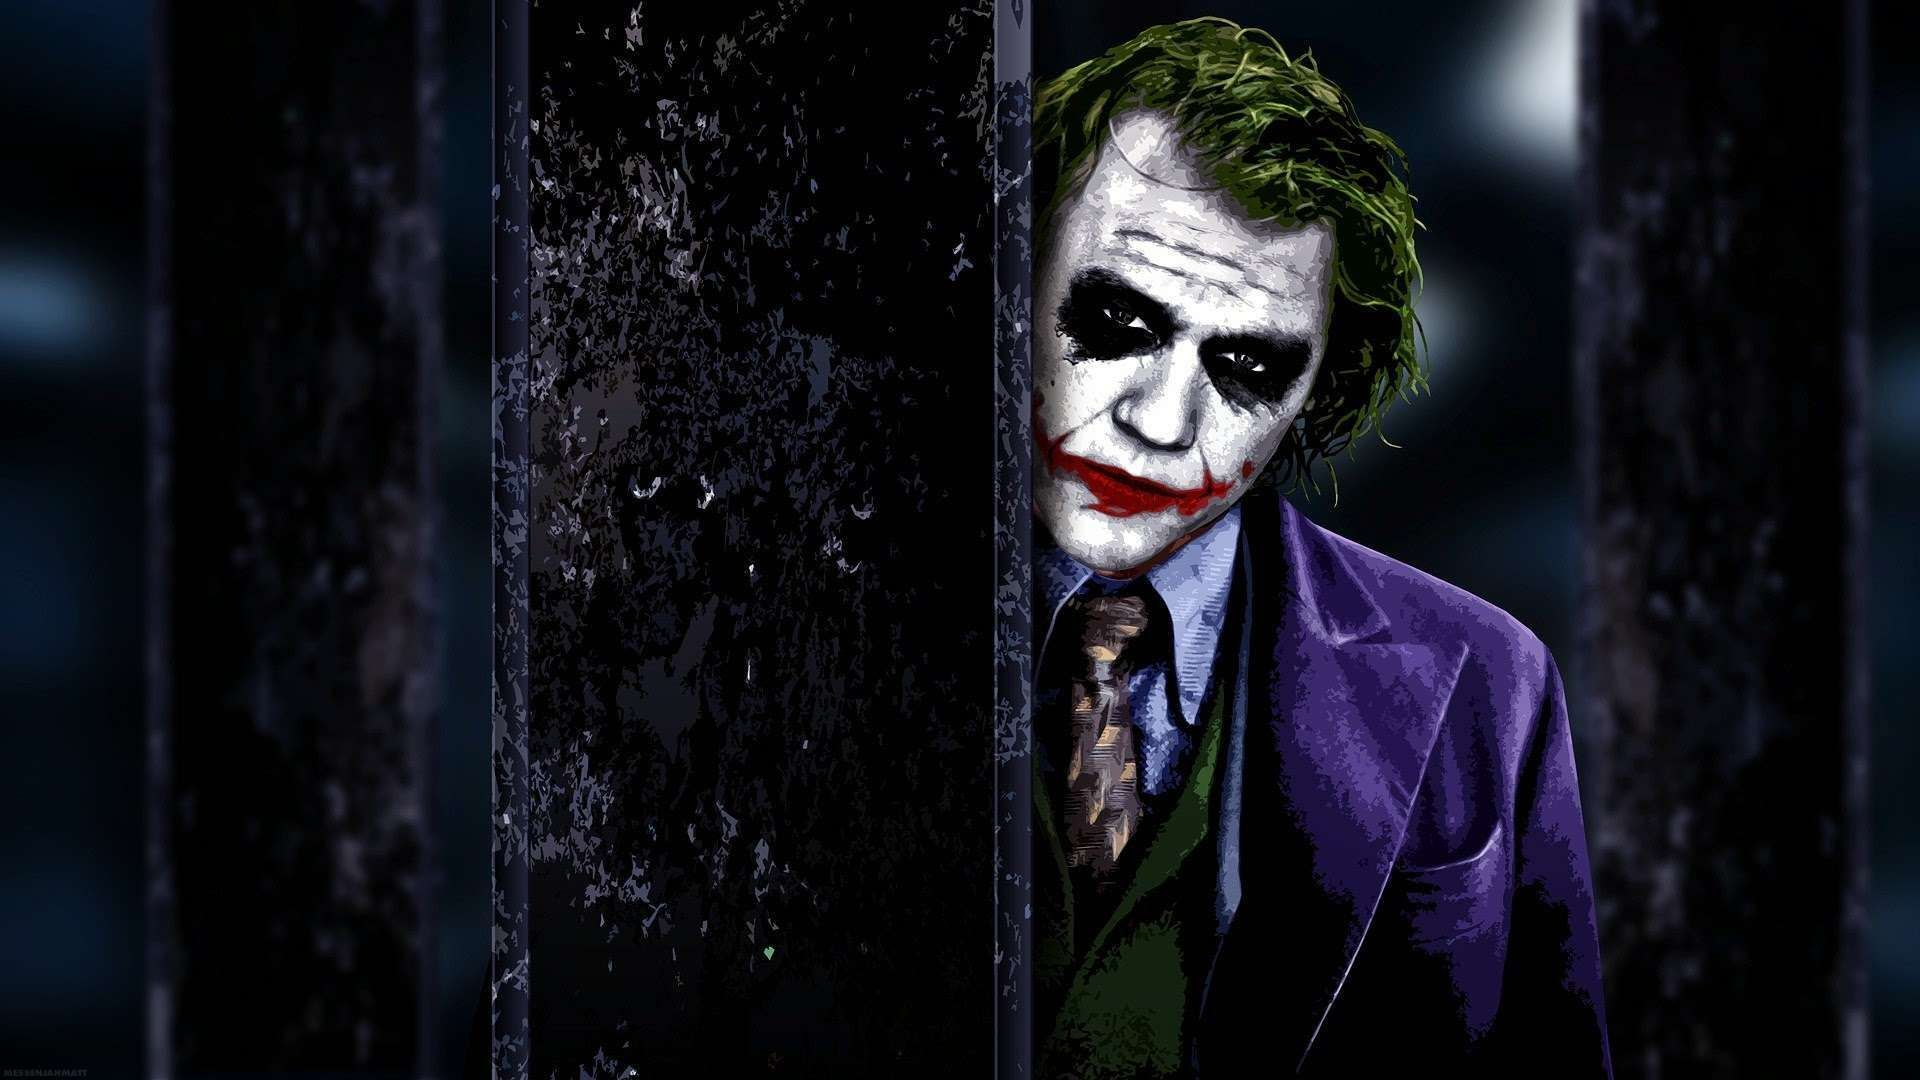 Joker Harley Quinn Wallpaper Hd 1080p Posted By Ryan Johnson